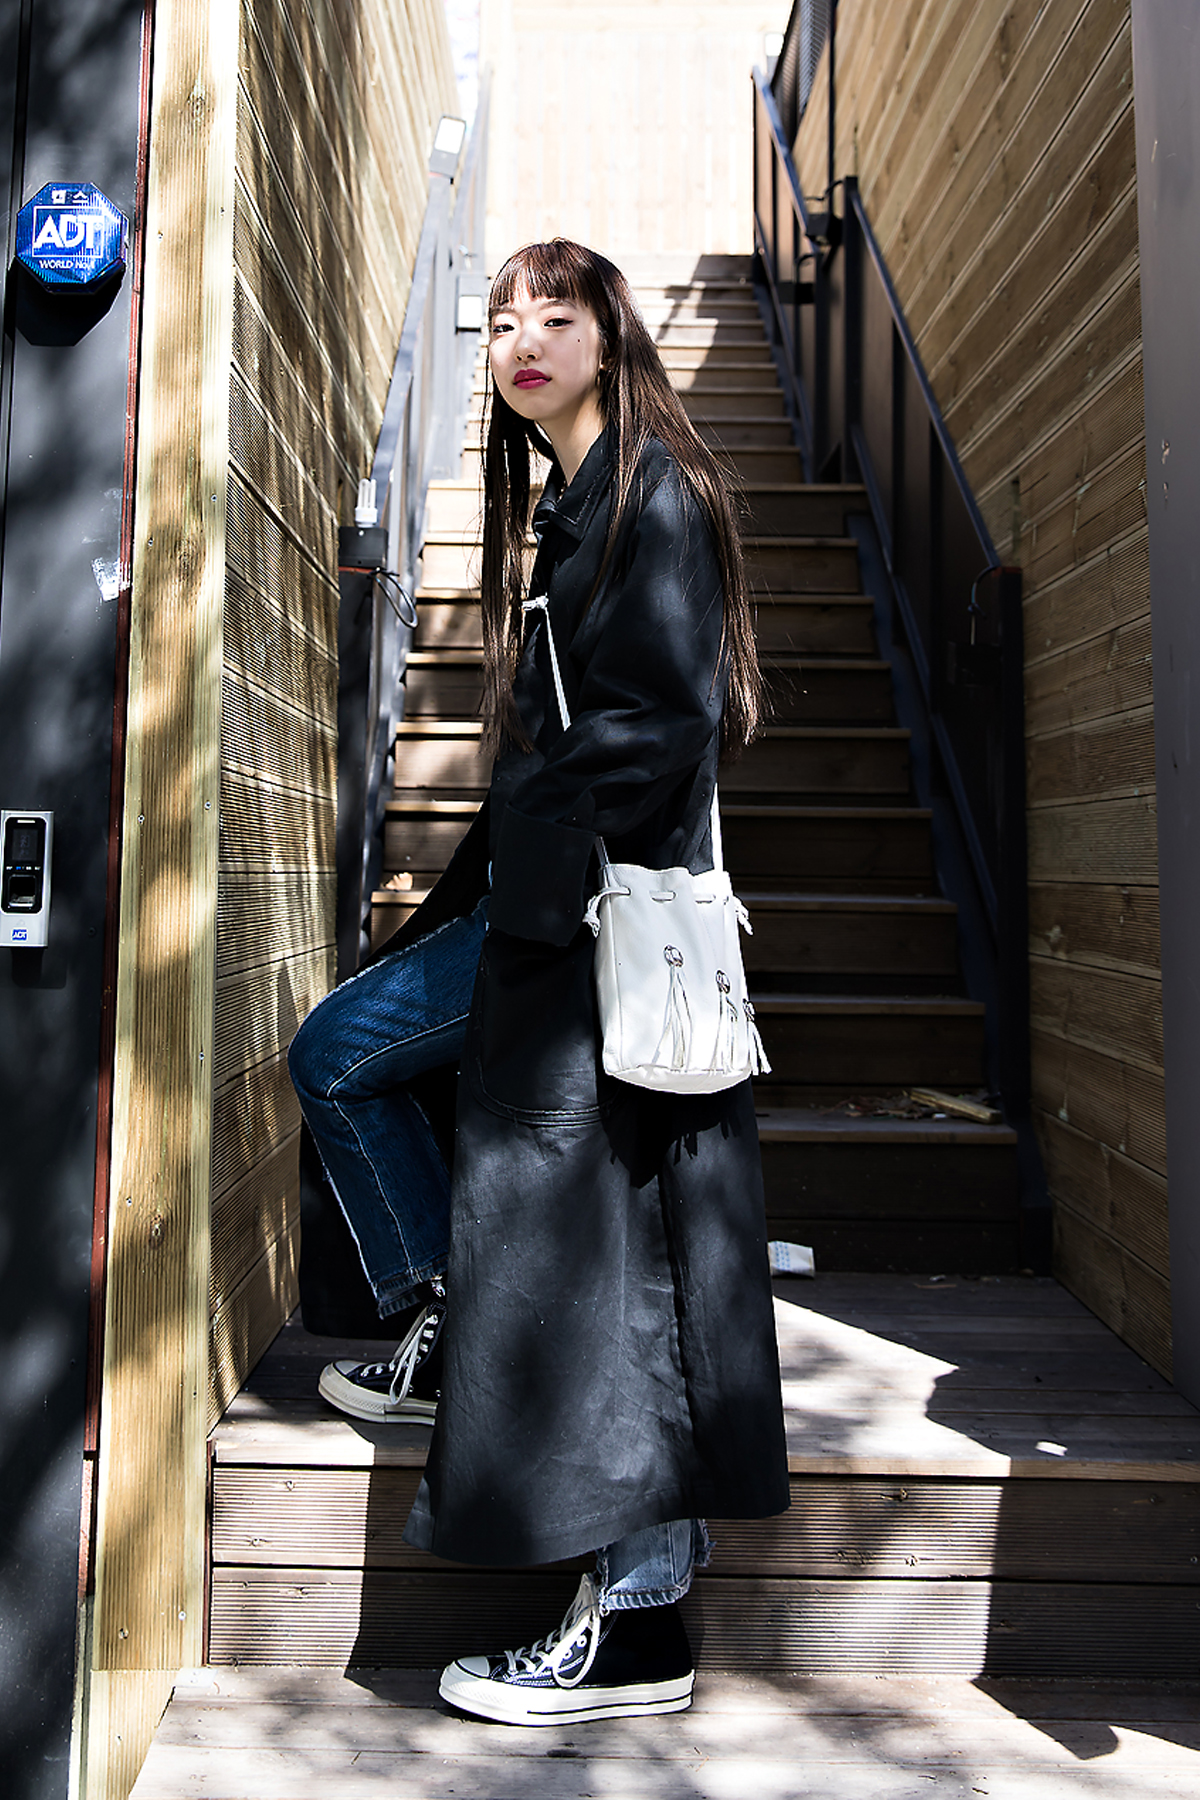 Fukumura Manae, Street Fashion 2017 in Seoul.jpg